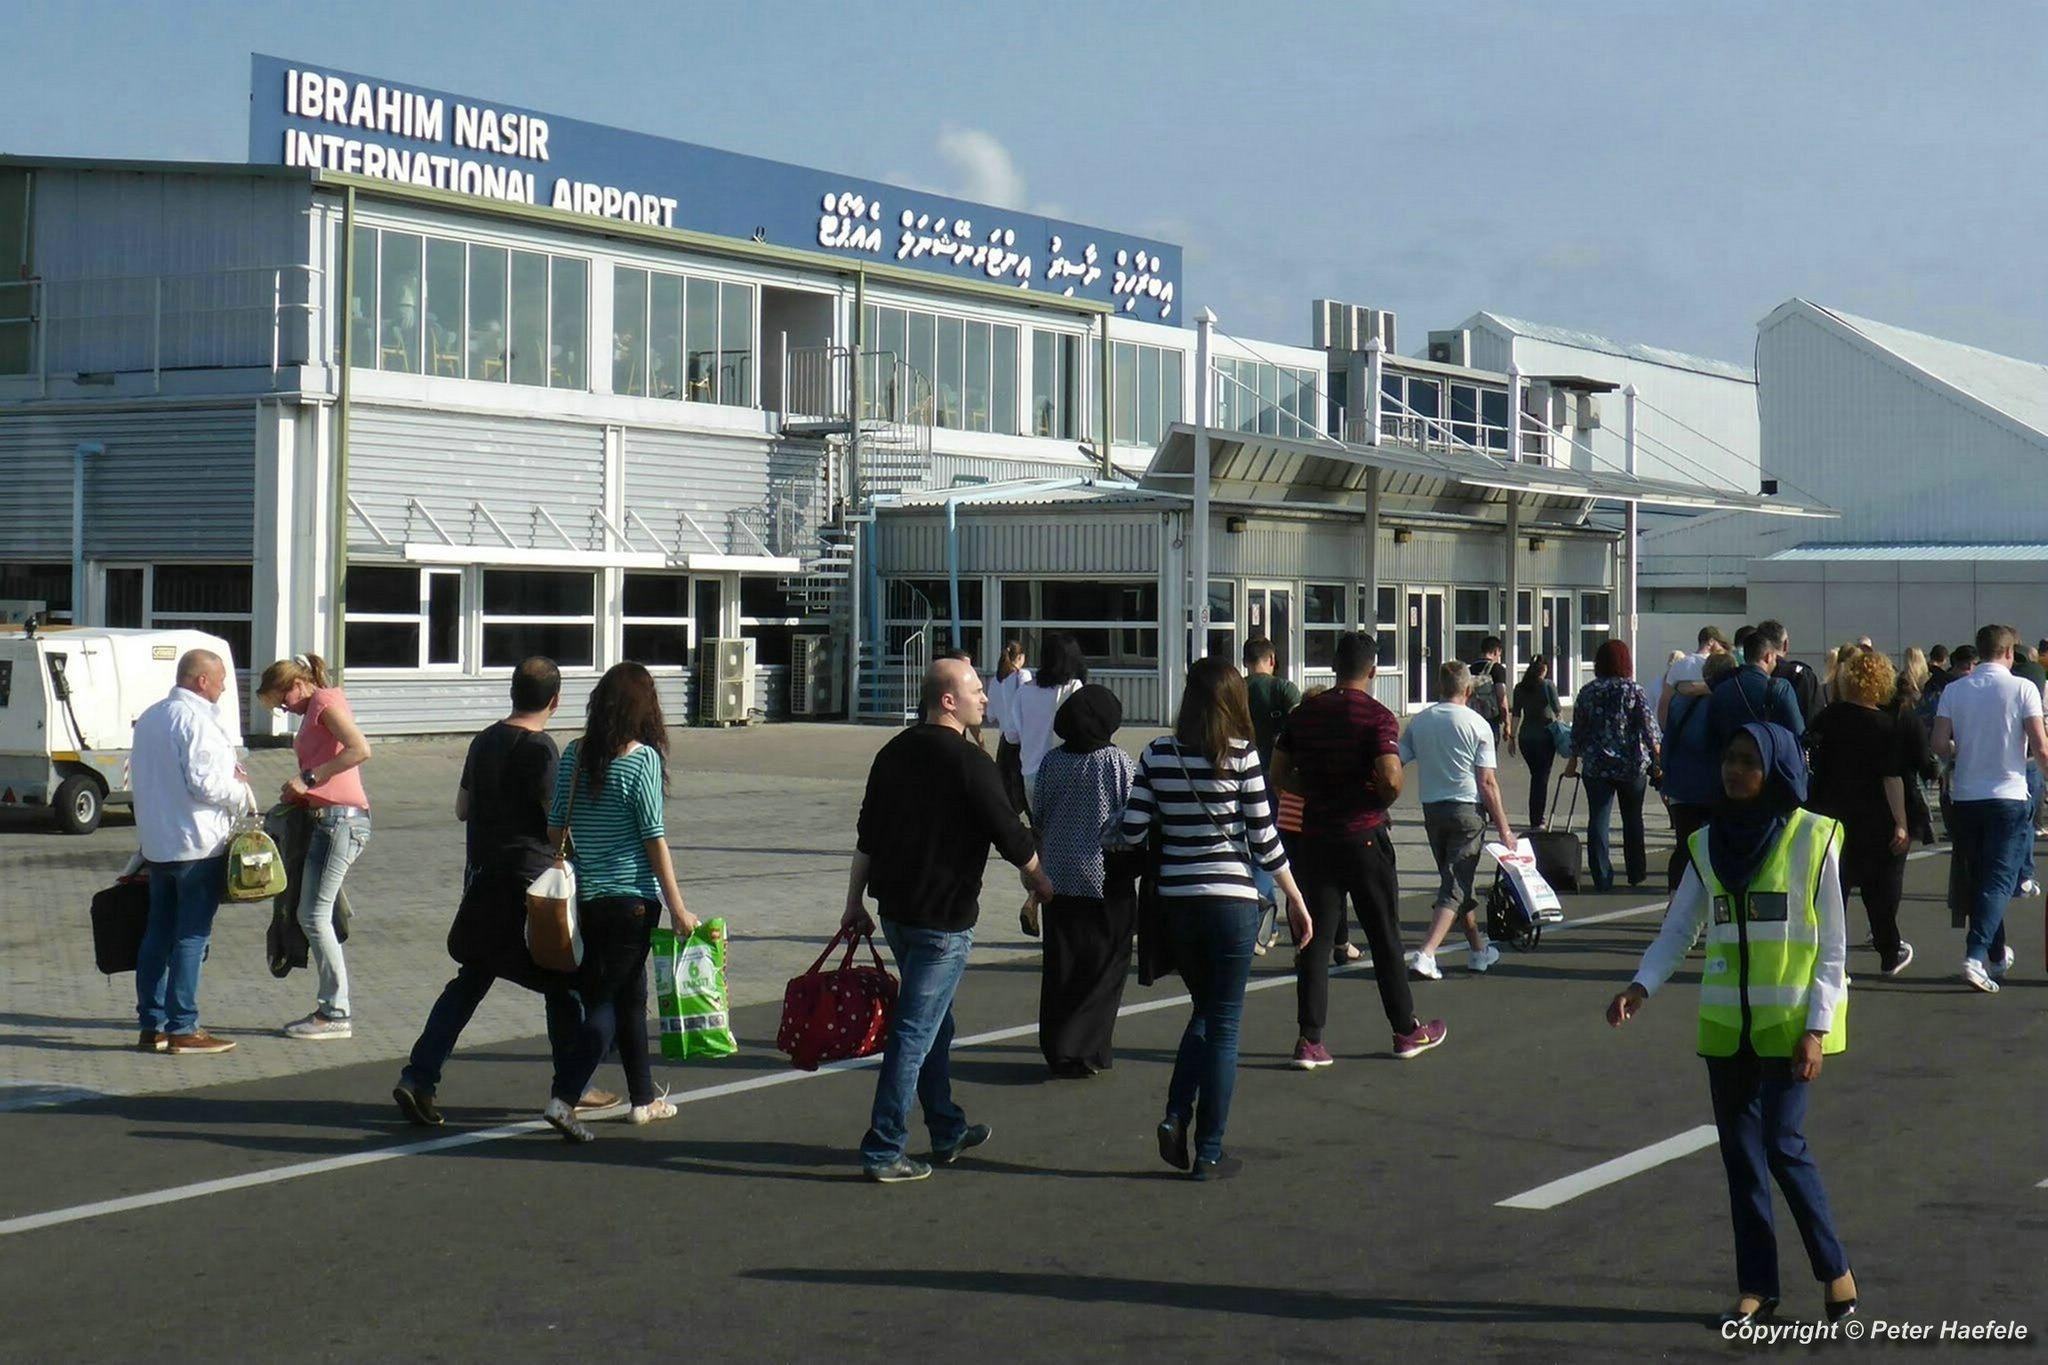 Ankunft auf dem Ibrahim Nasir International Airport Male